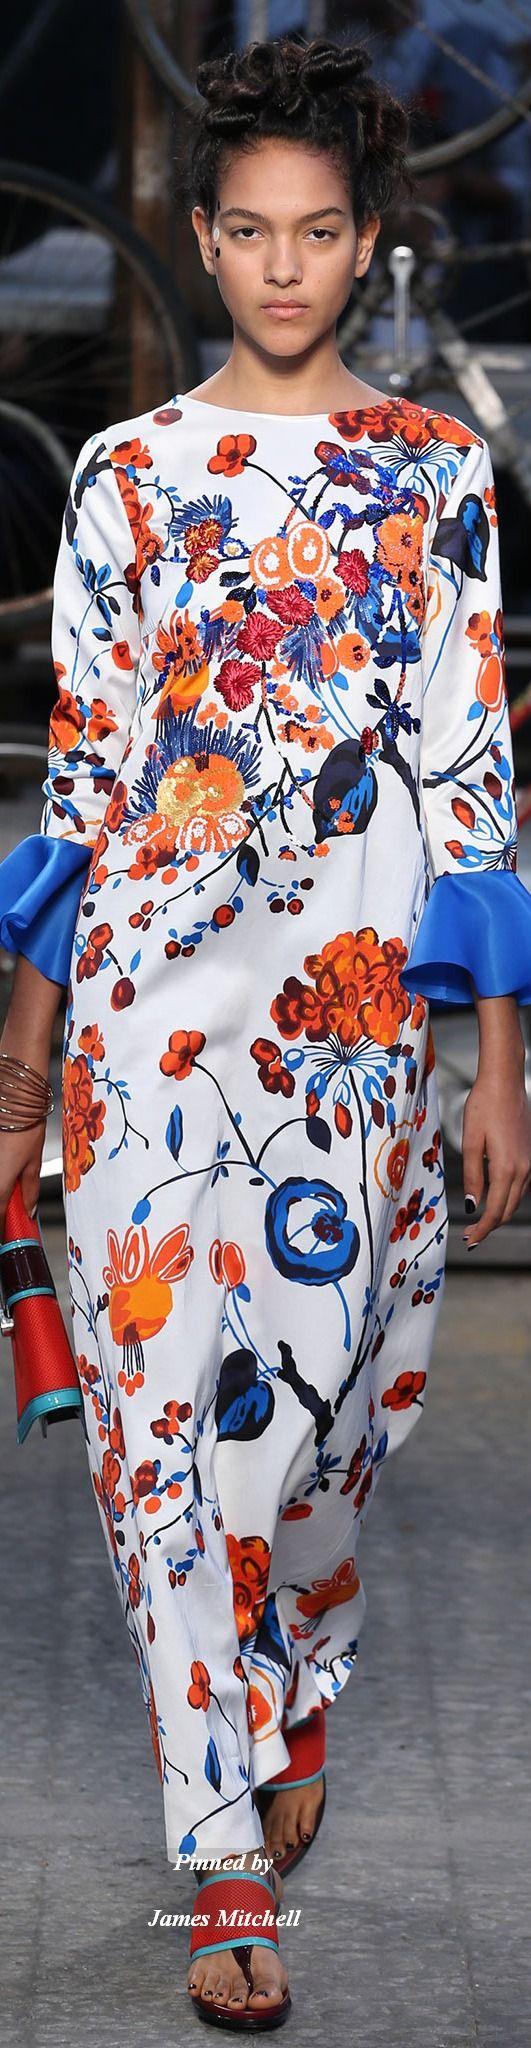 Antonio Marras Collection  Spring 2015 Ready-to-Wear